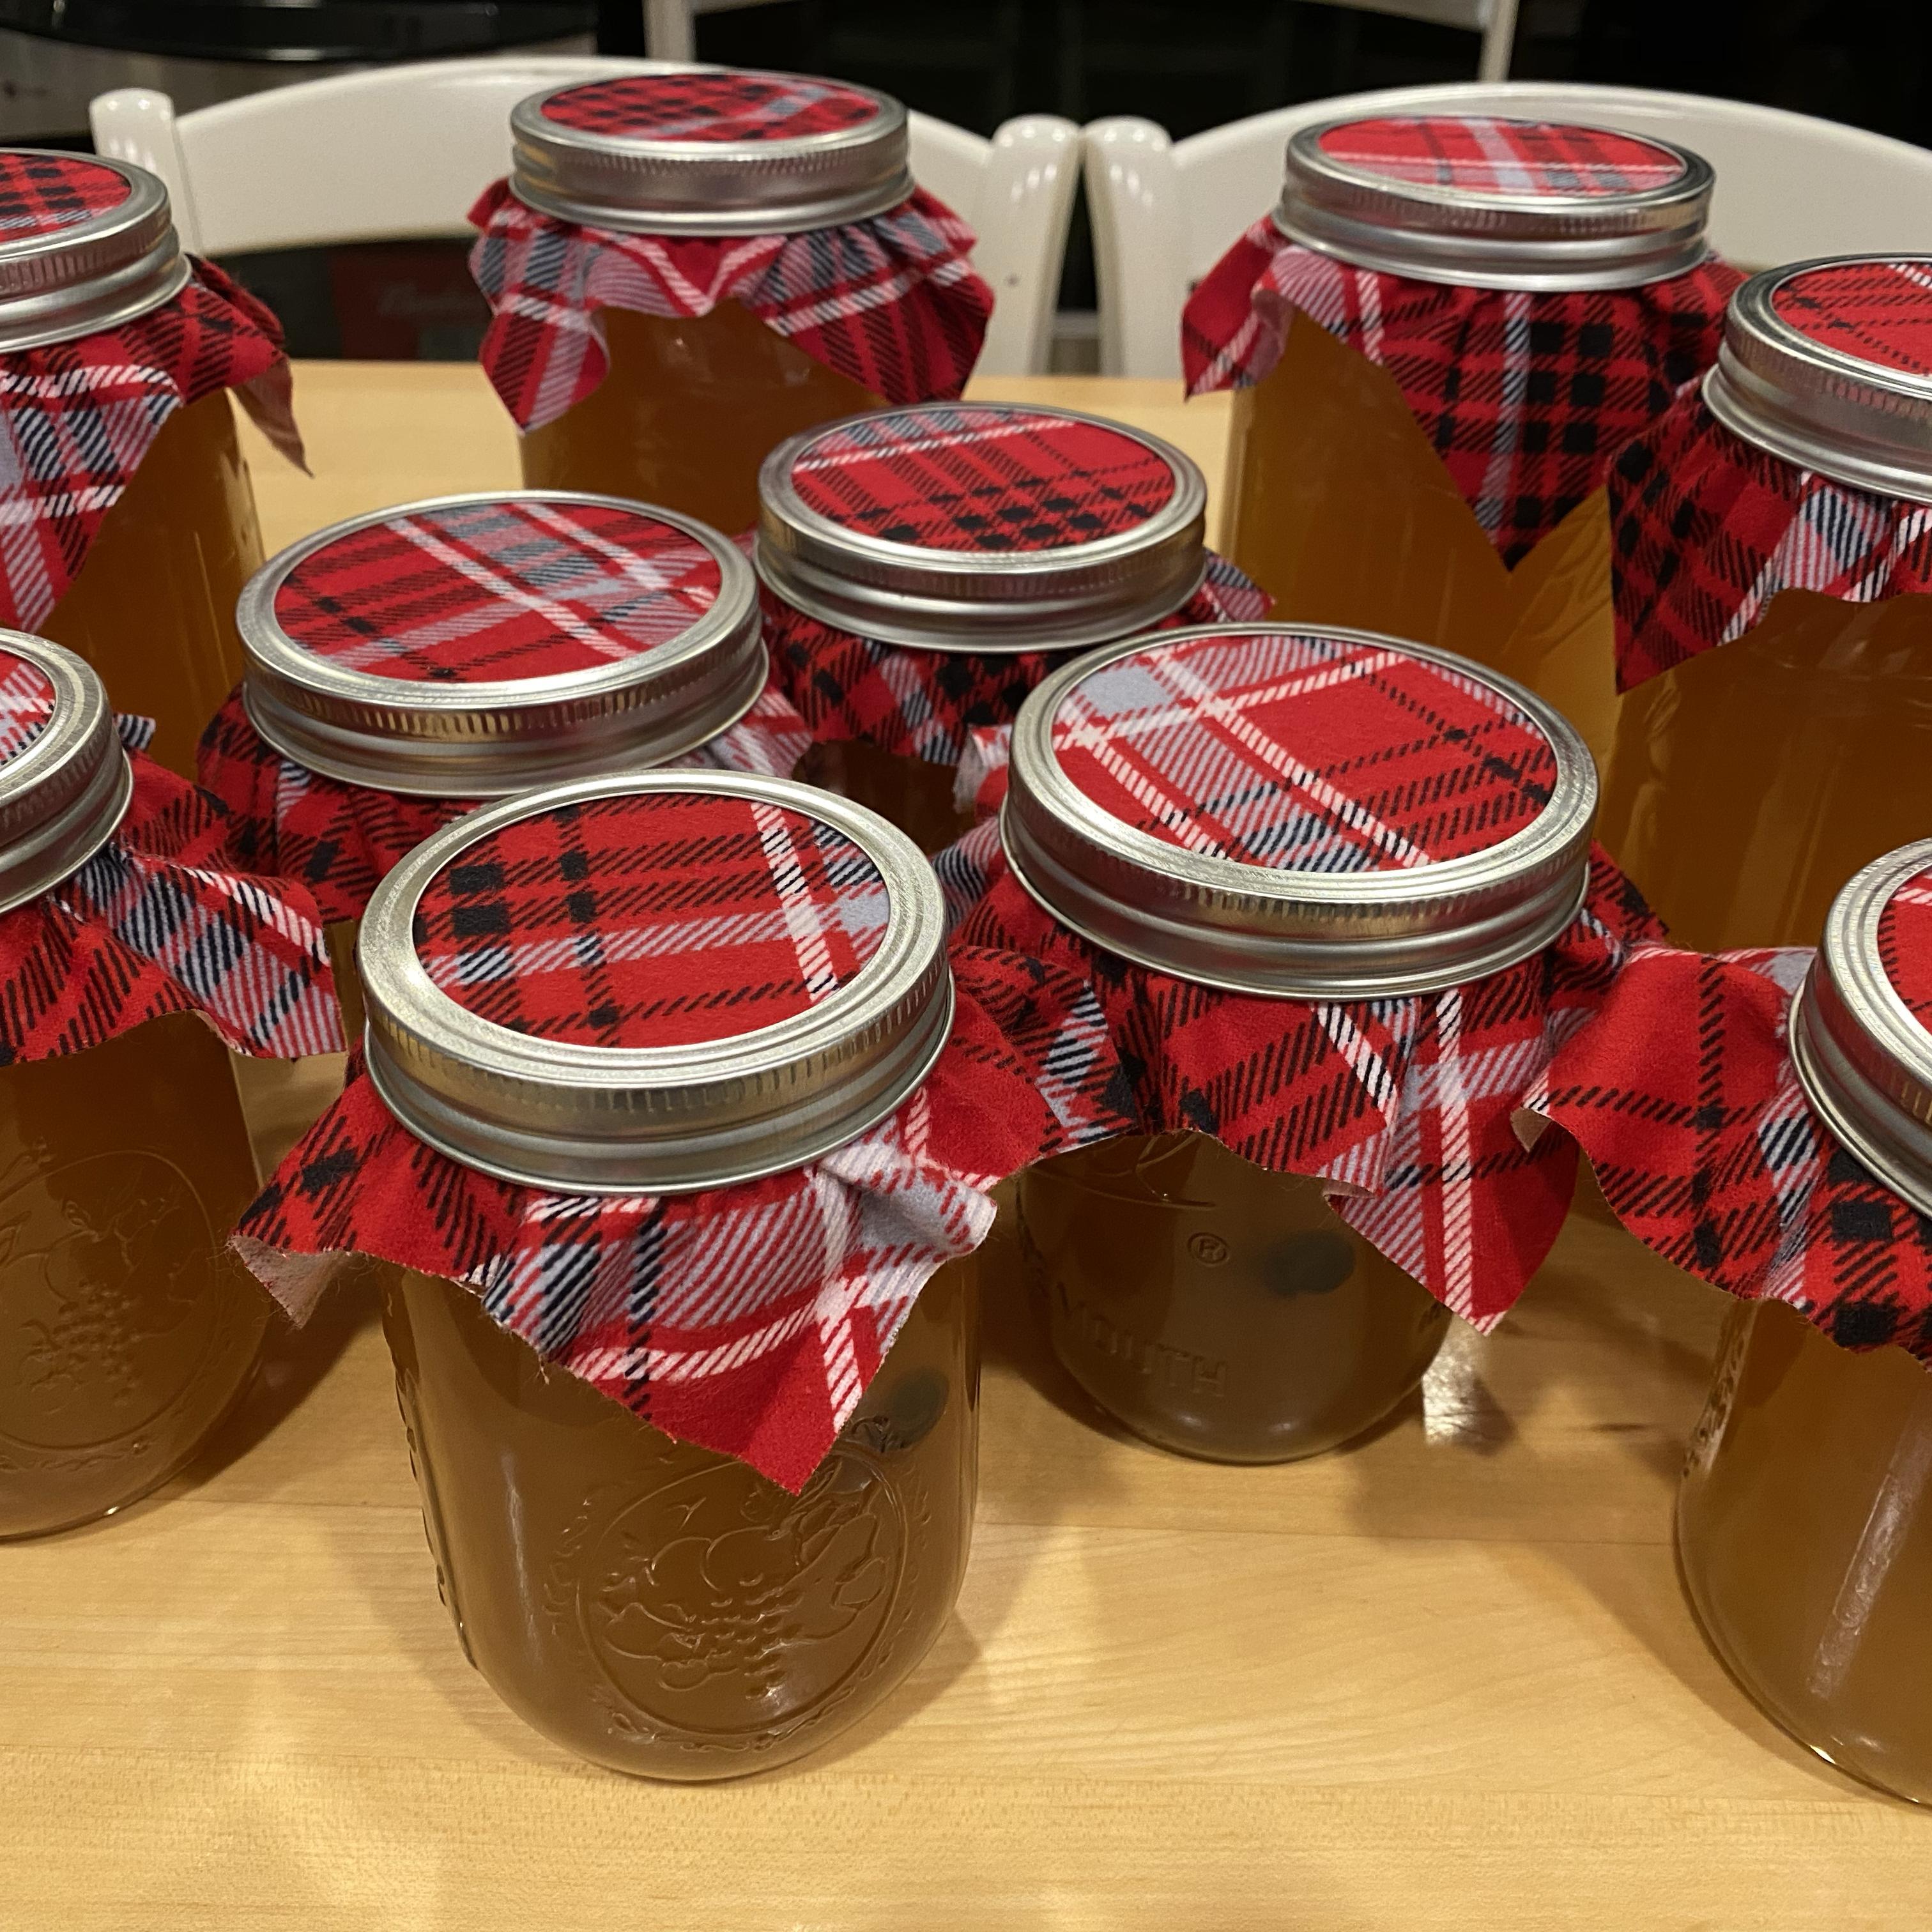 Grandma's Apple Pie 'Ala Mode' Moonshine